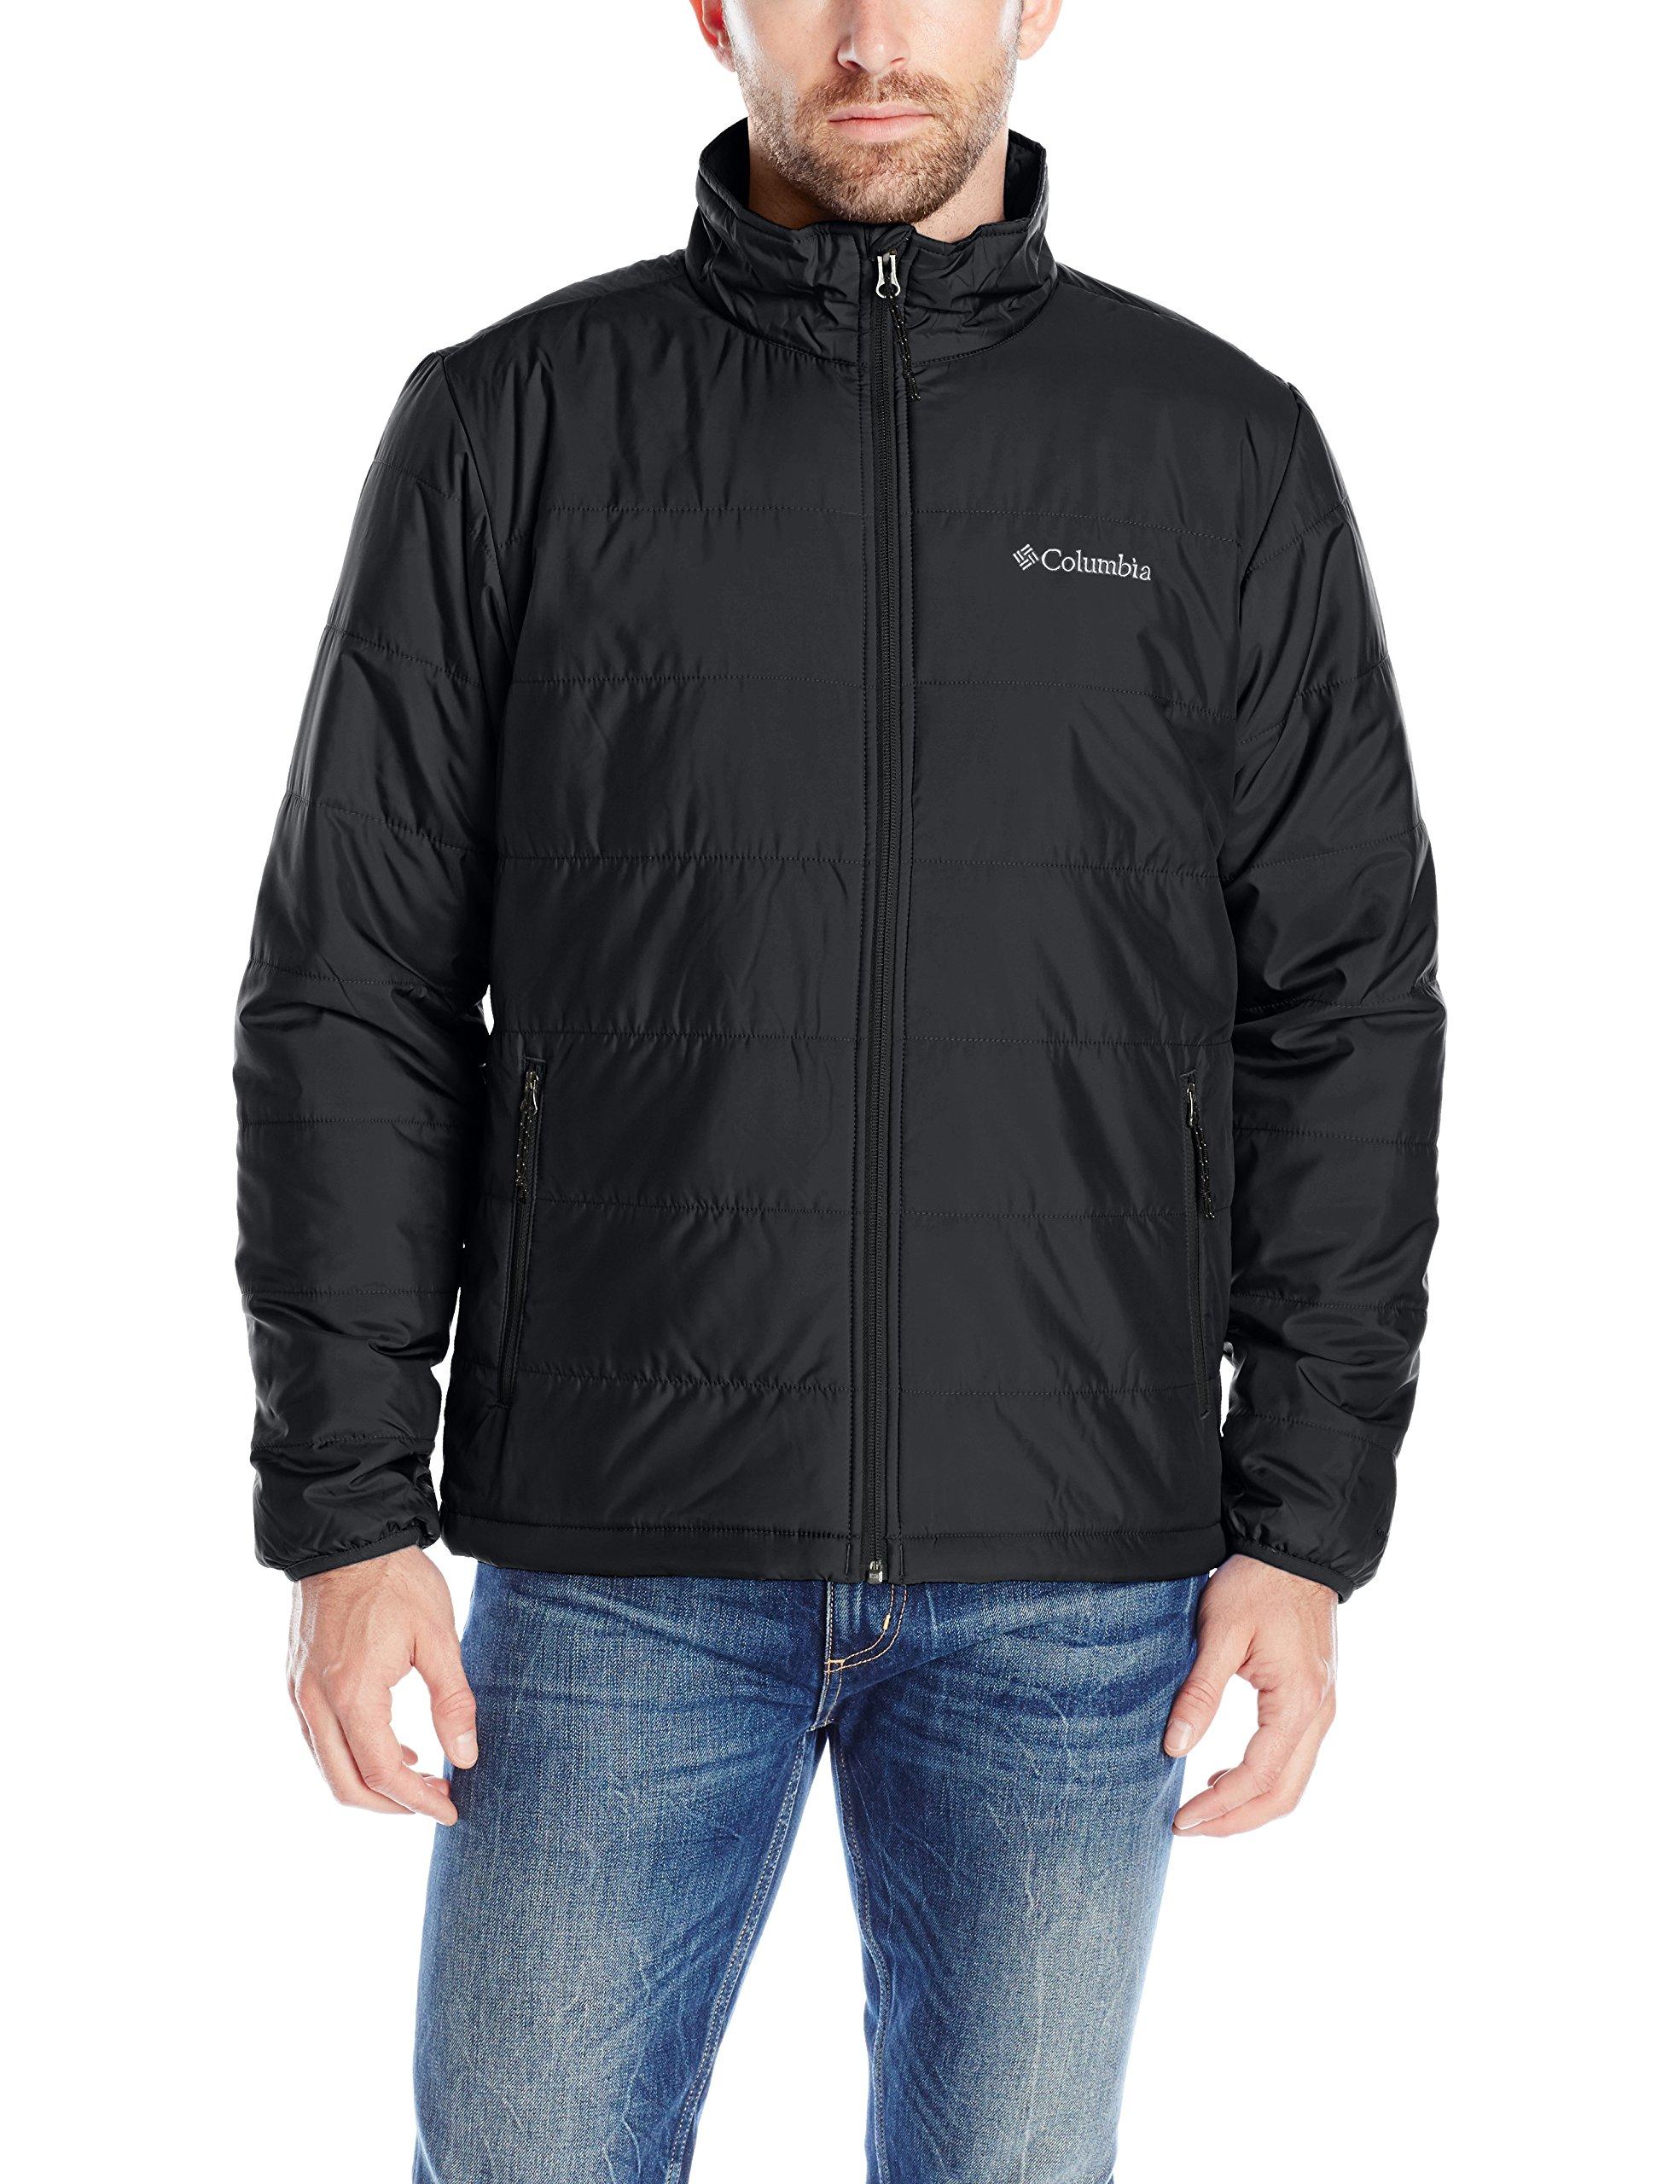 Columbia Men's Saddle Chutes Jacket, Black, X-Large by Columbia